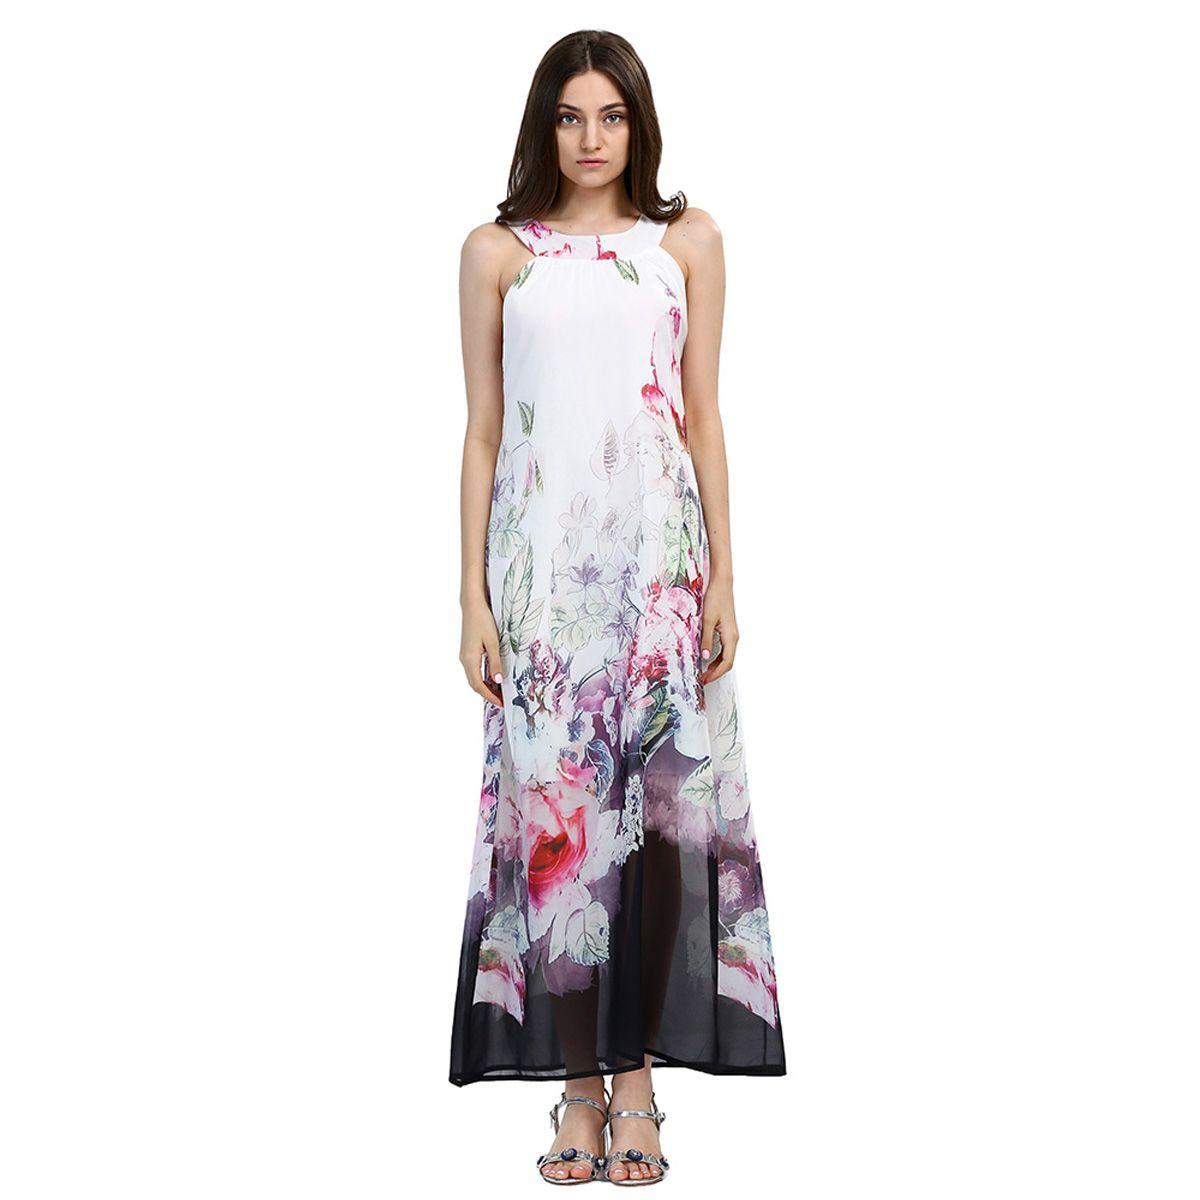 2019 Beach Boho Maxi Dresses Print Floral Plus Size Bar Party White Long Dress Sleeveless Summer Sundress Vestidos Beachwear Tunics Robe New